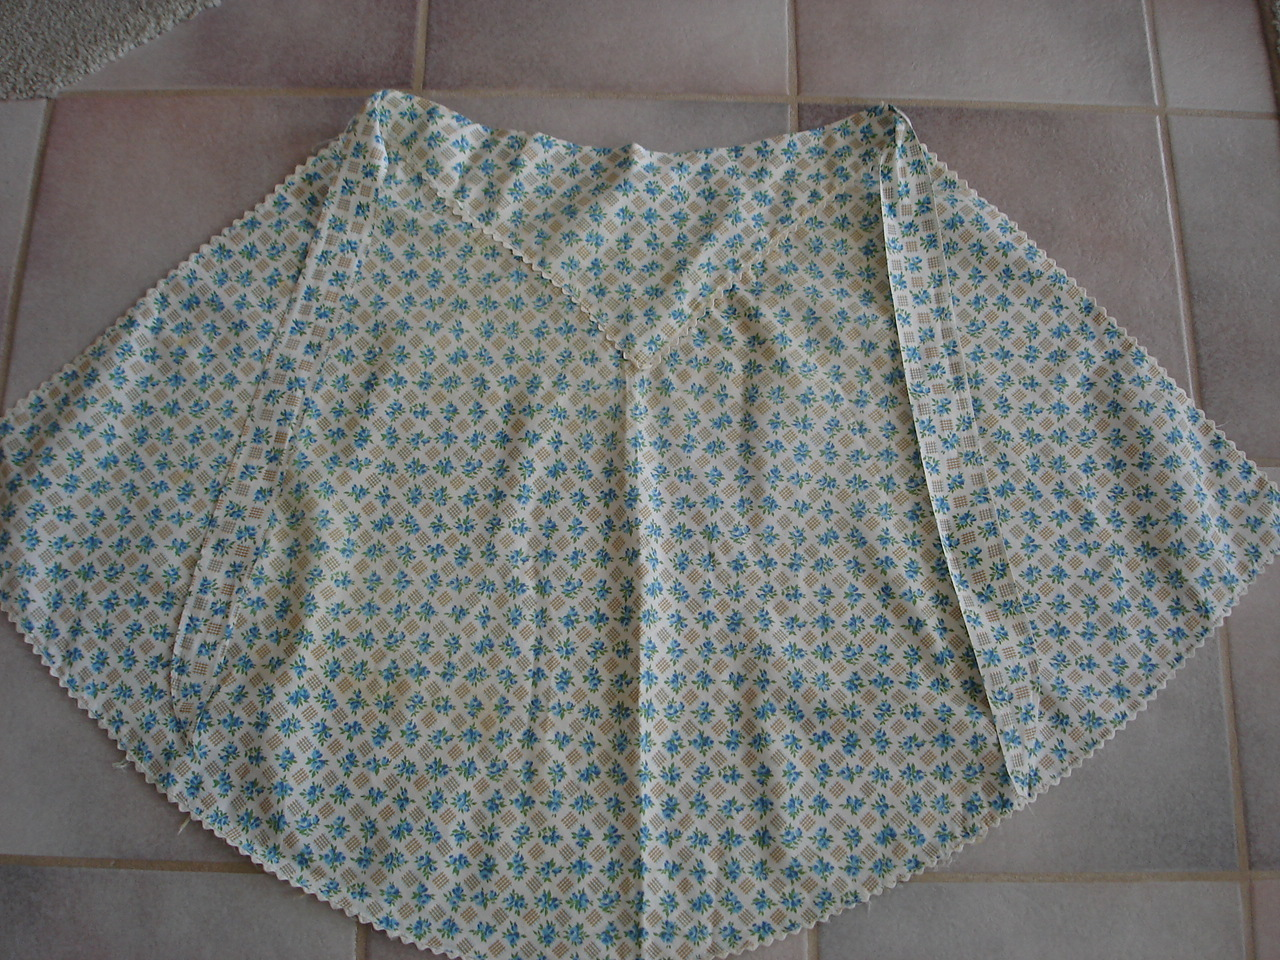 Vintage Lot 3 Flower Fabric Half Aprons, Ruffle